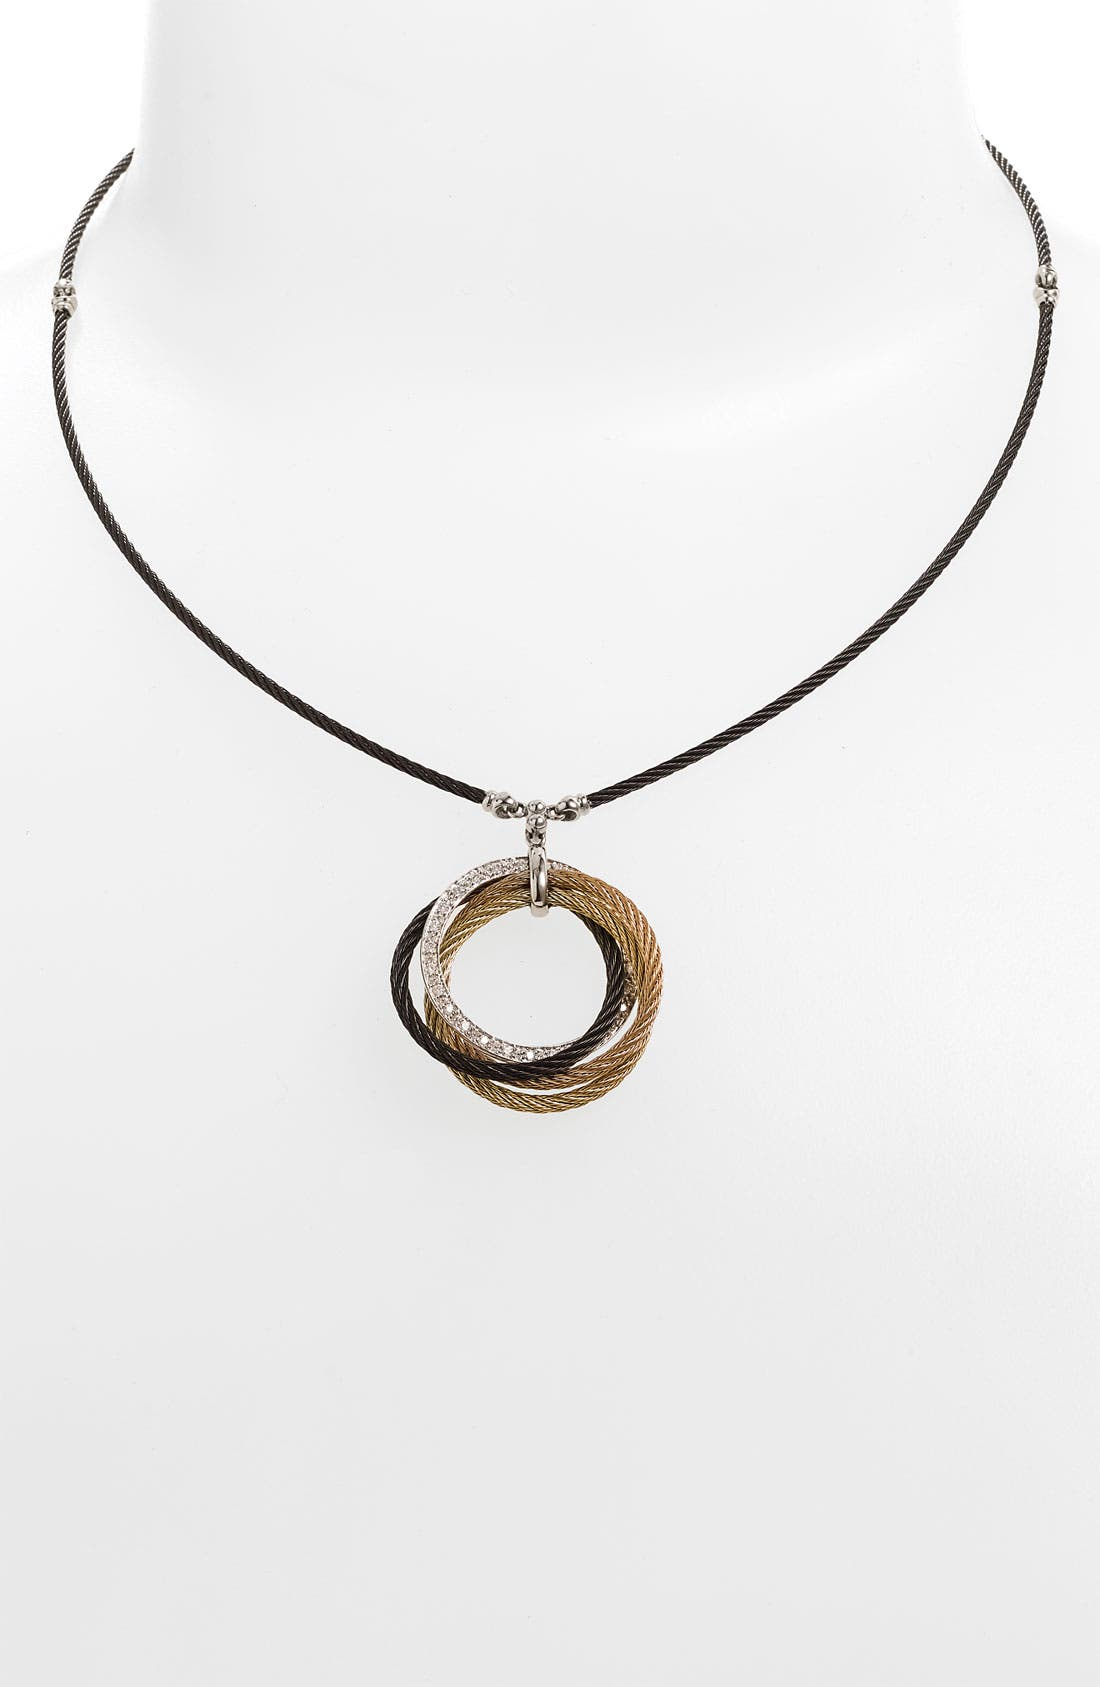 Main Image - ALOR® Interlocked Cable Diamond Pendant Necklace